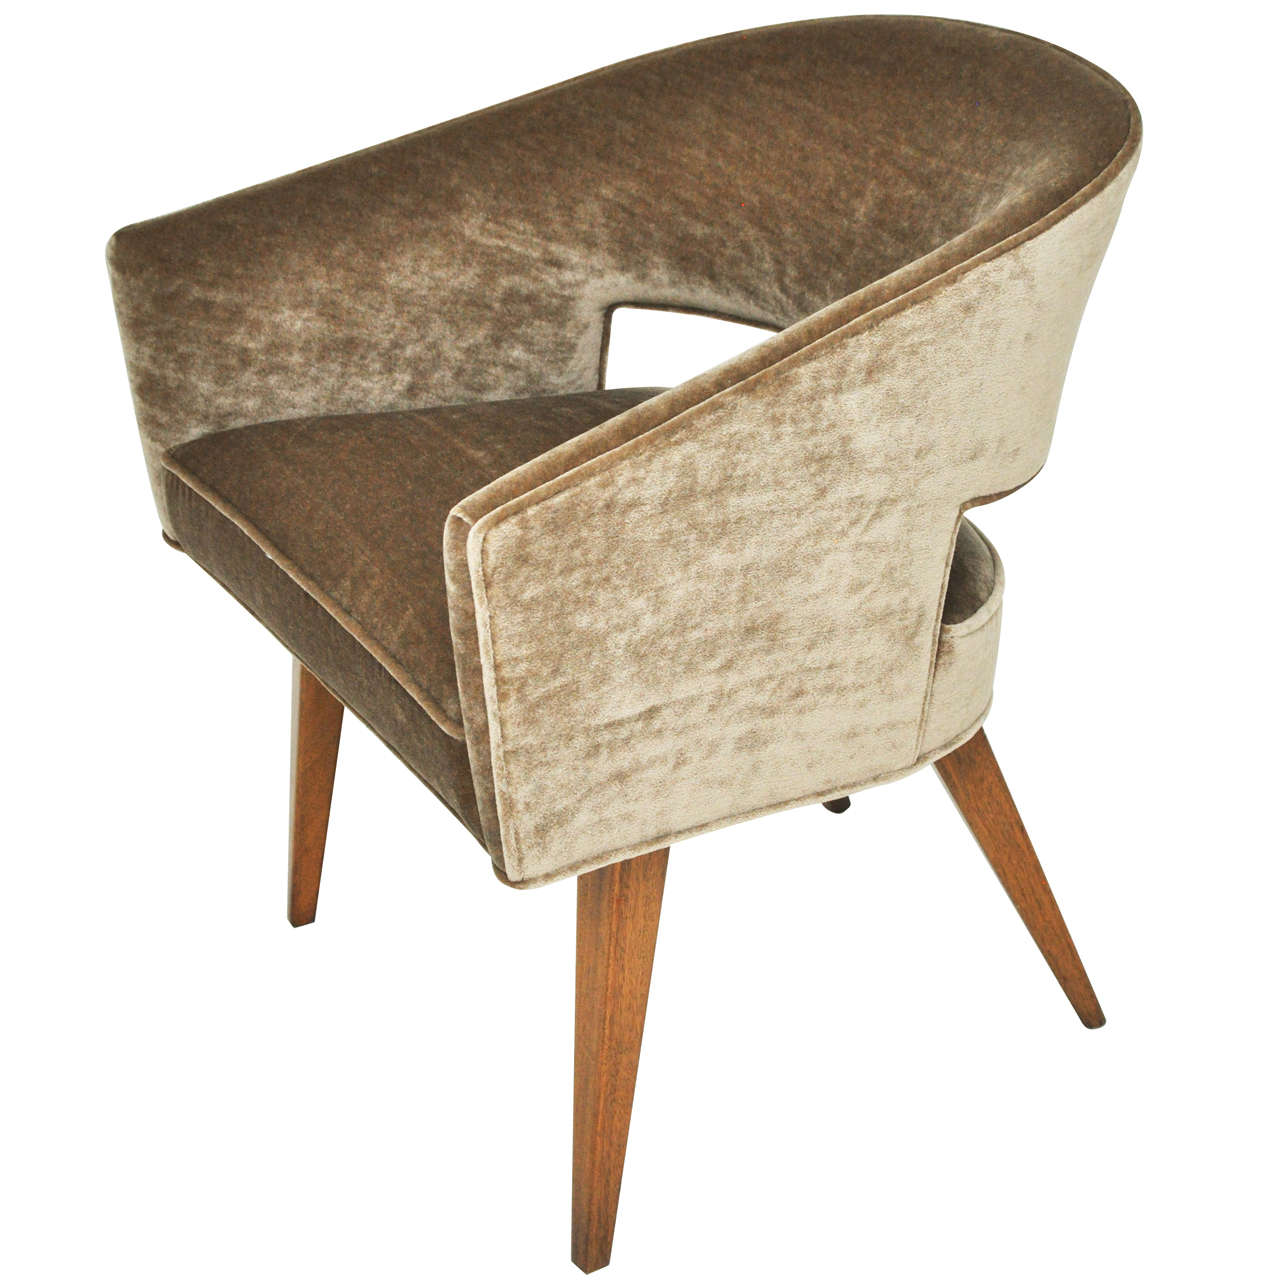 Dunbar open back lounge chair edward wormley at 1stdibs - Edward wormley chairs ...